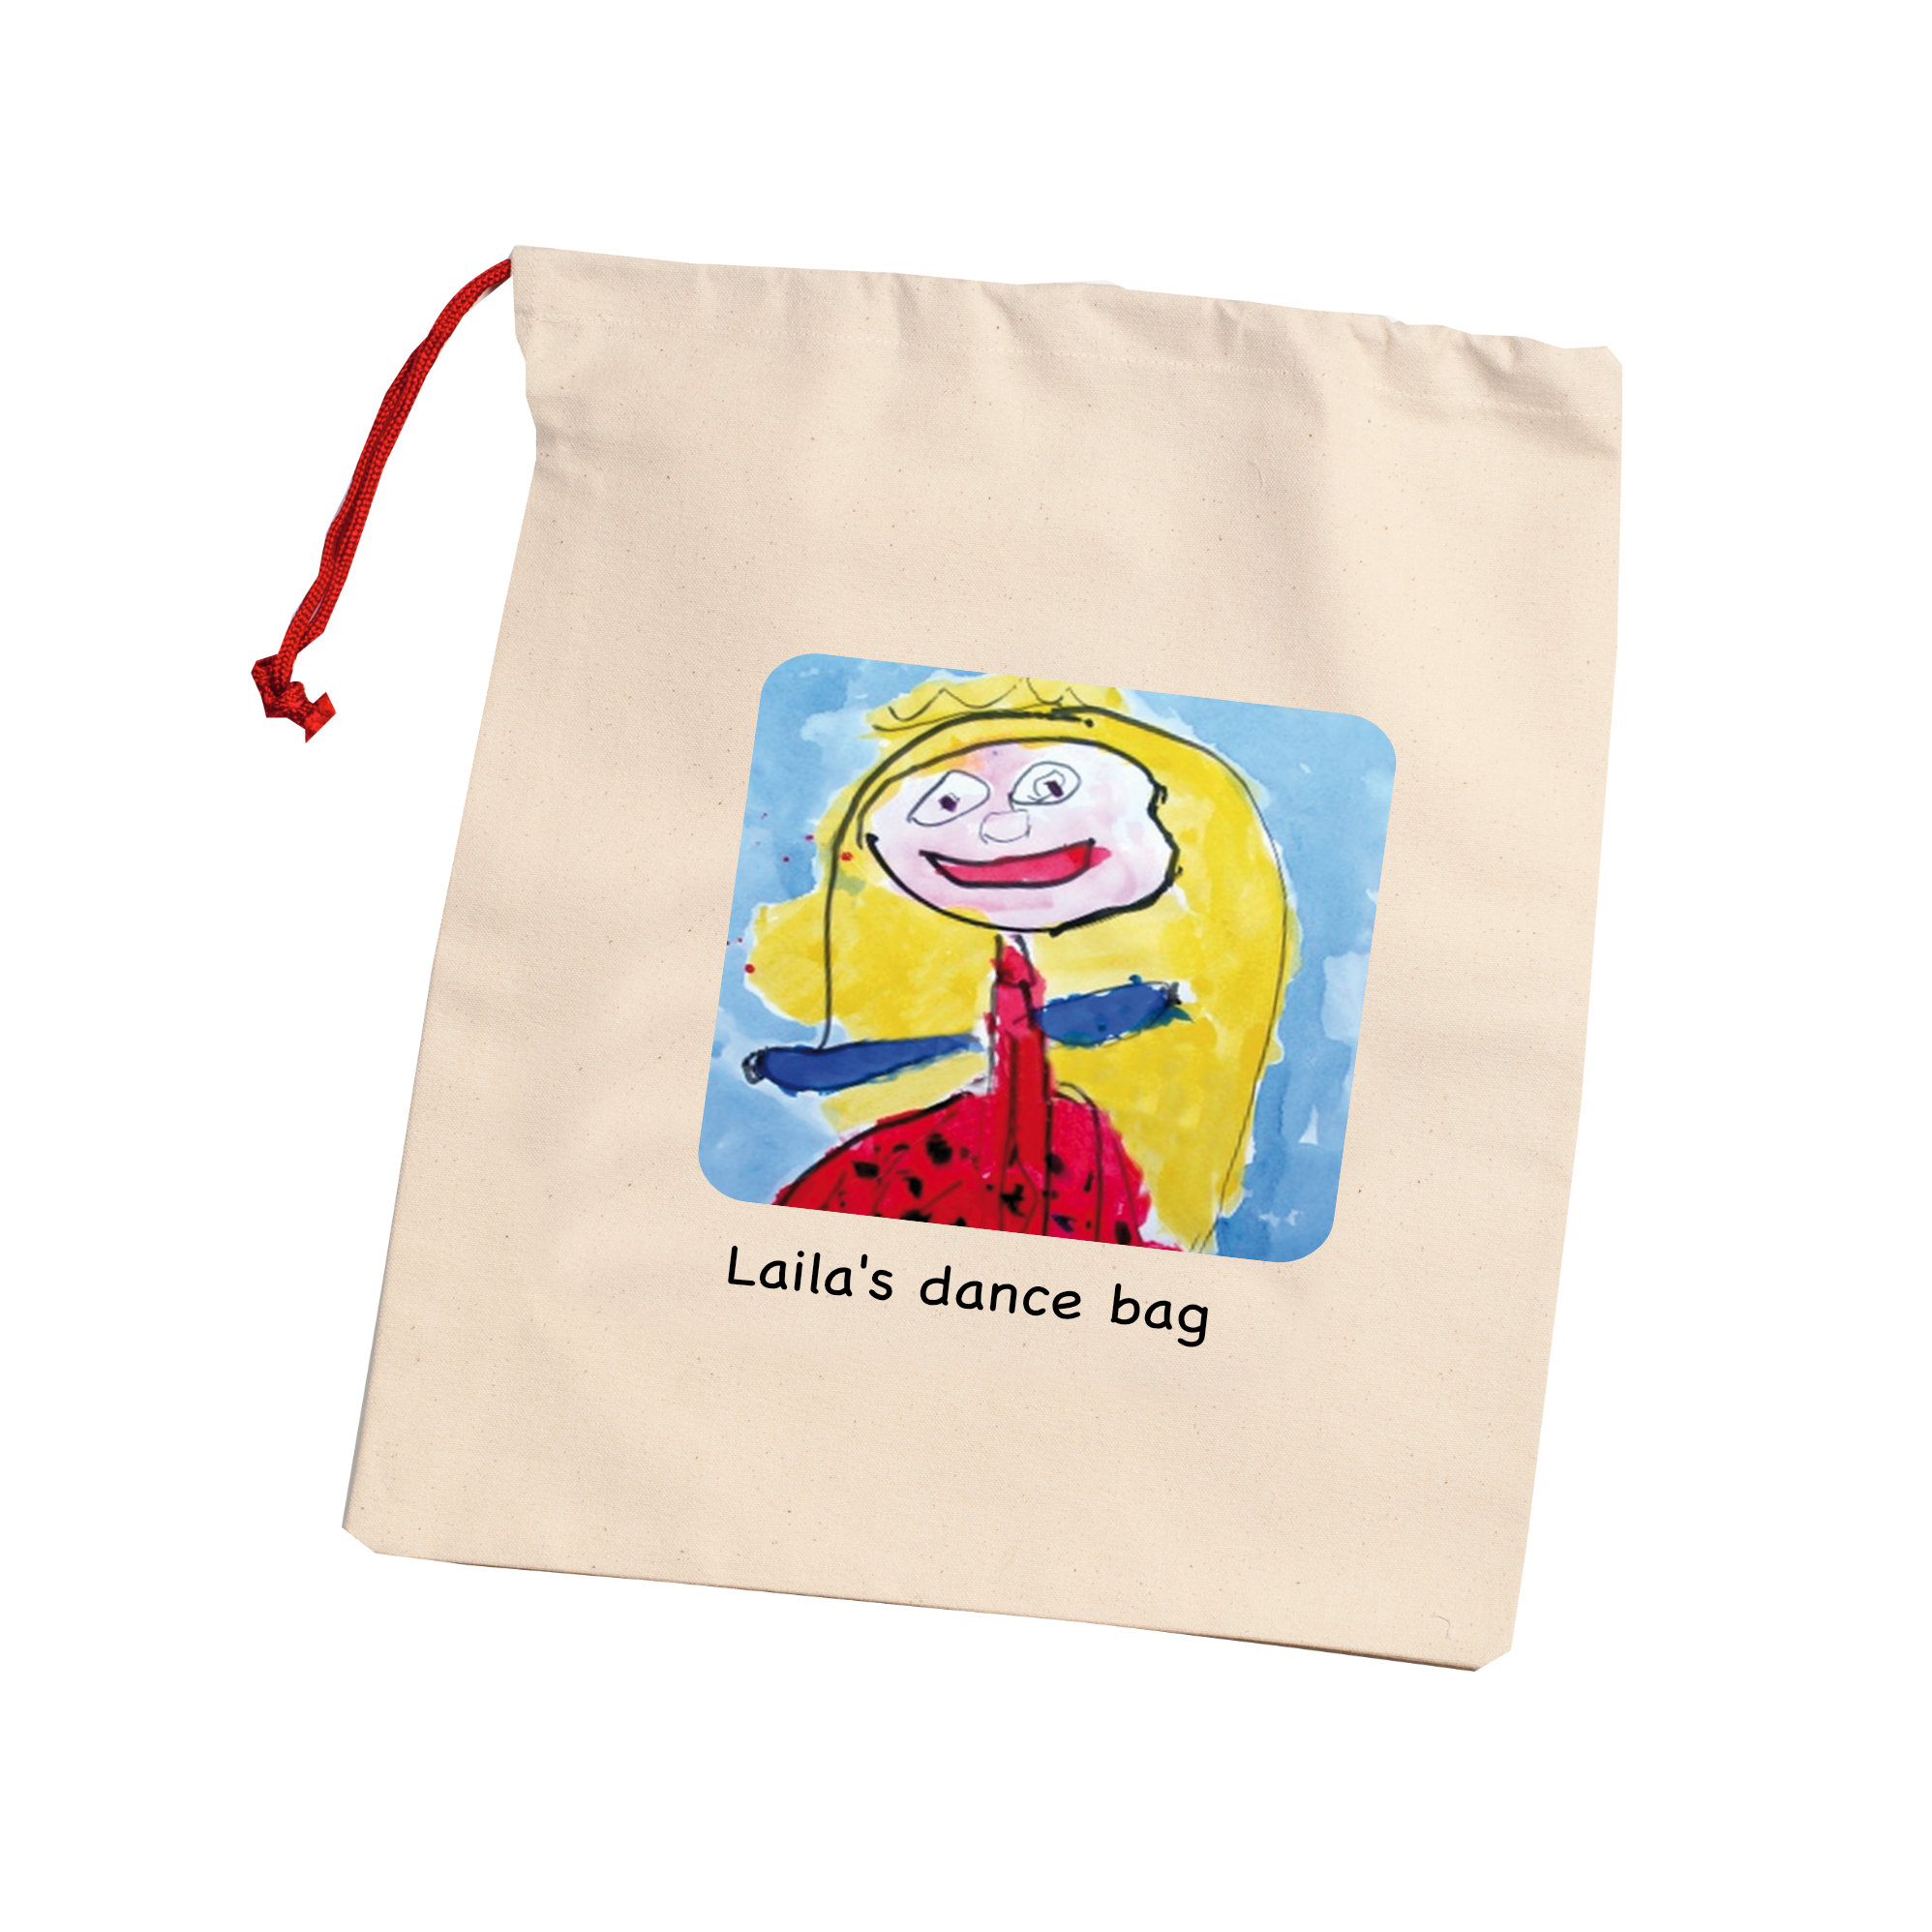 School-leavers-gym-bag@2x.jpg